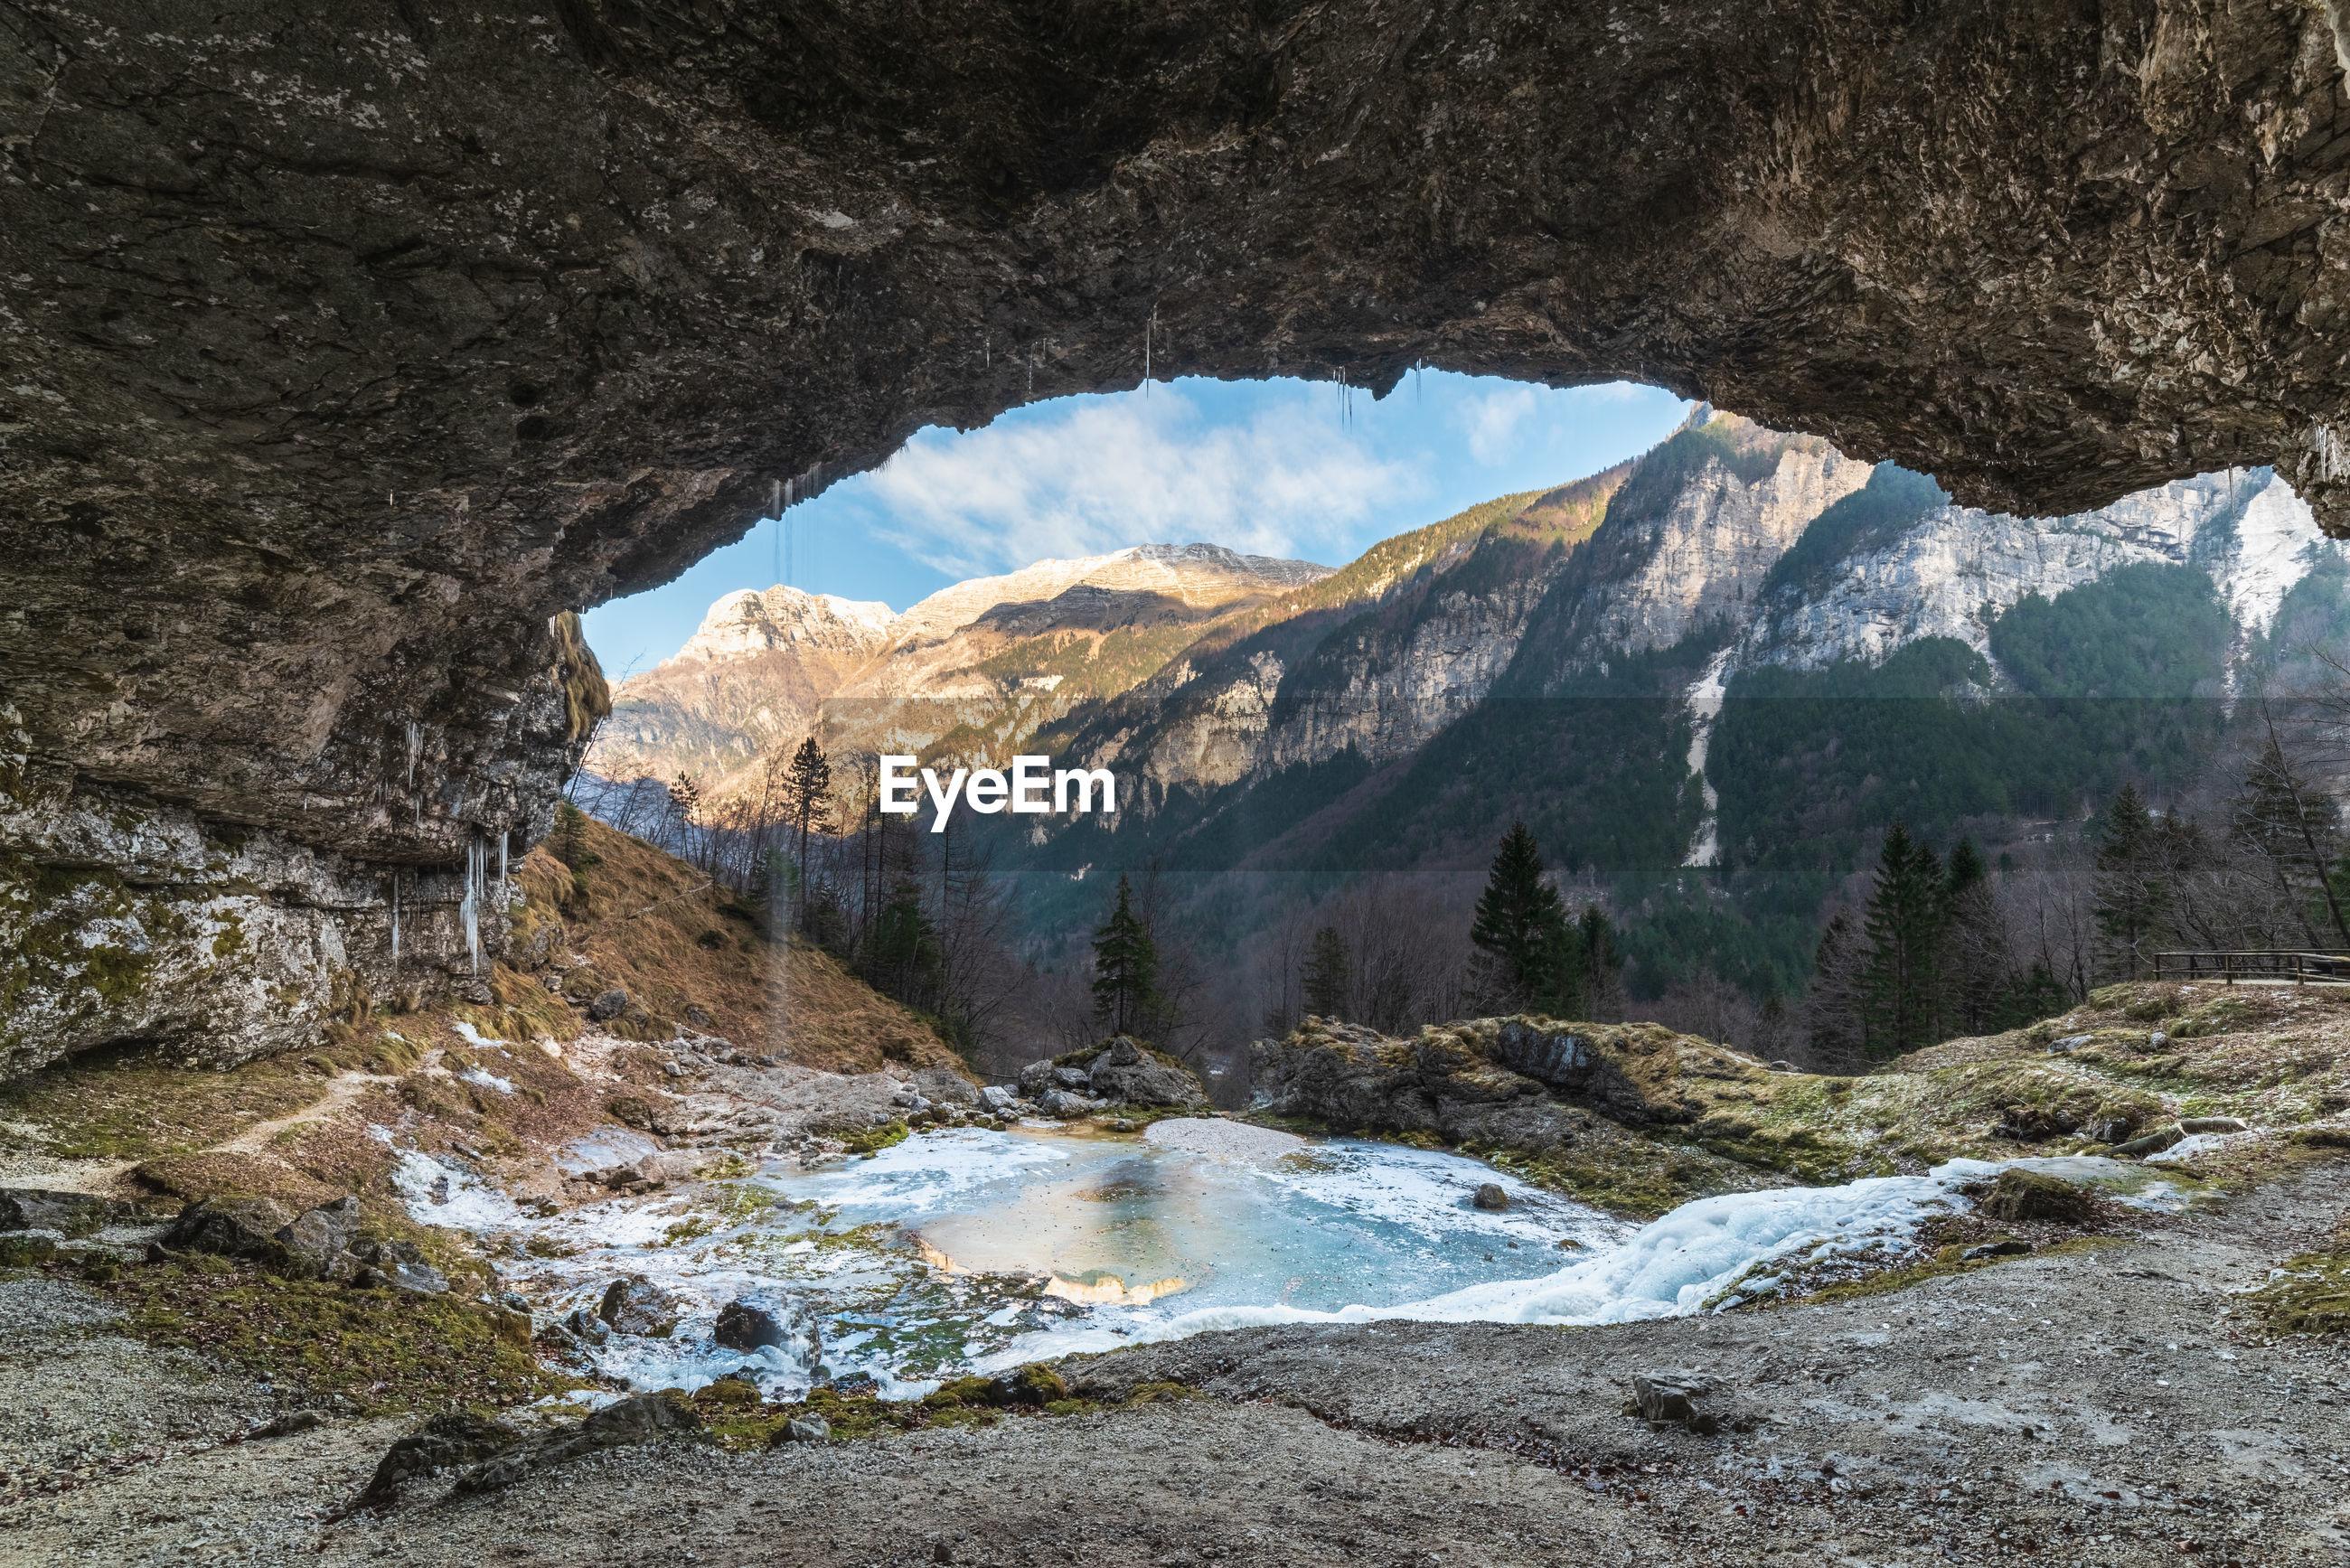 Winter. ice games in the fontanon of goriuda waterfall. friuli, italy.